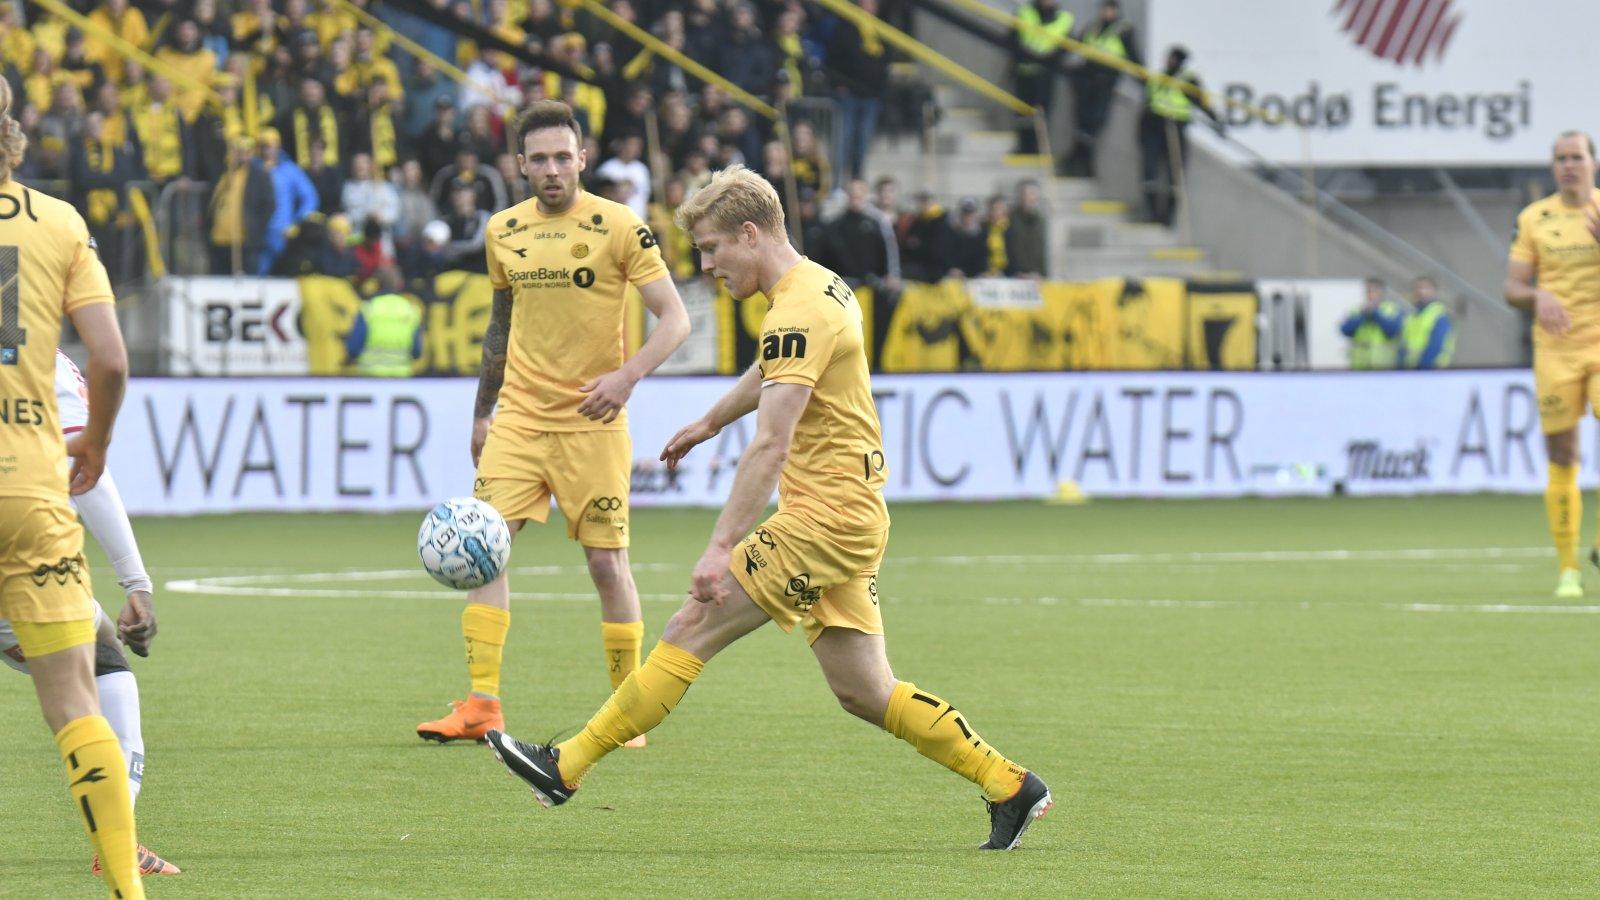 Emil Jonassen og José Angel mot Tromsø 16. mai 2018.